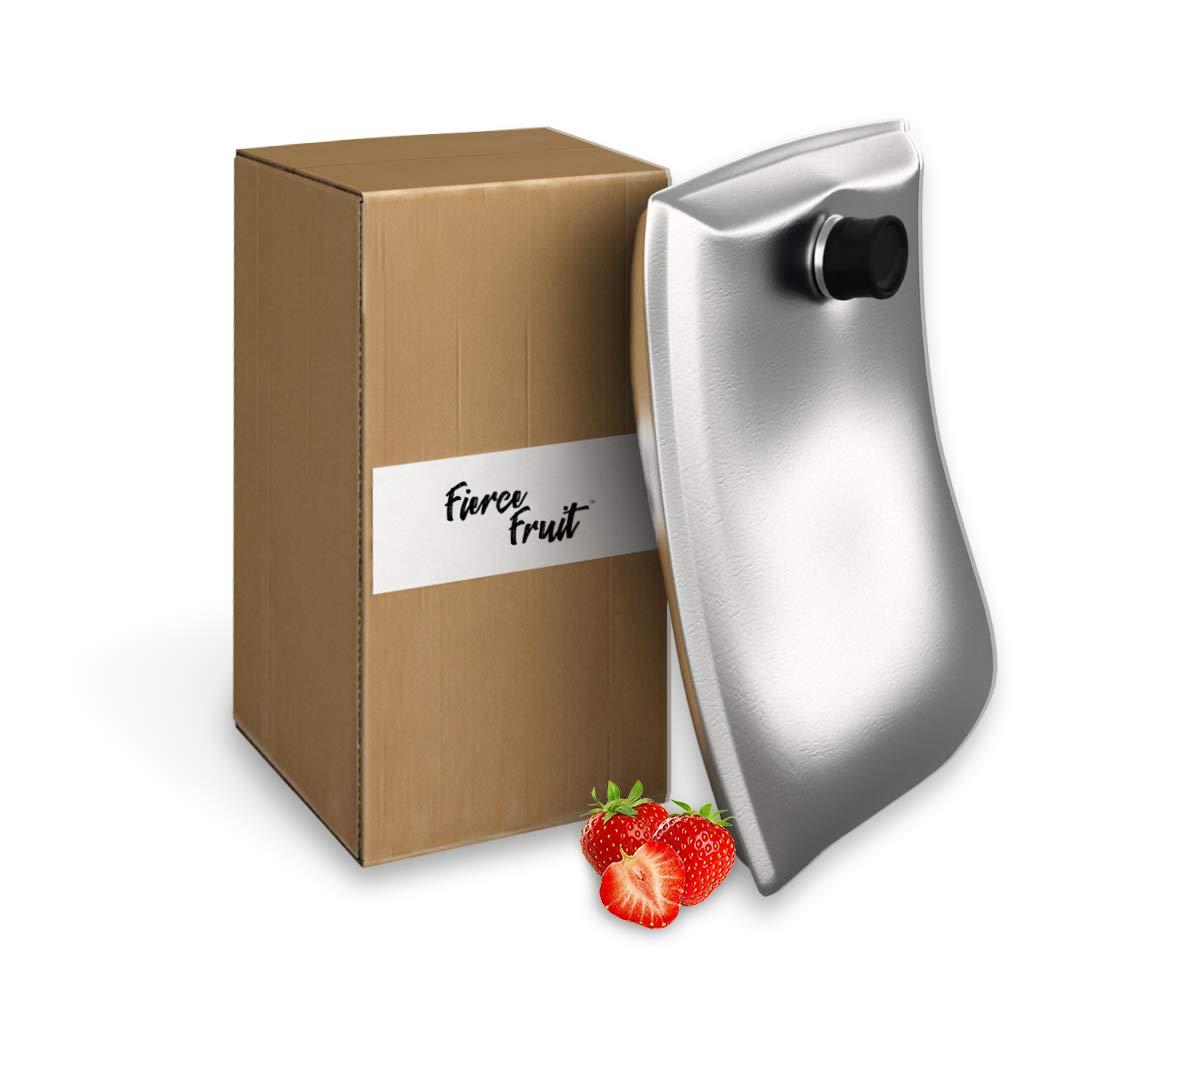 Fierce Fruit- All Natural Premium Fruit Puree-(Strawberry) 11 LB (Strawberry)